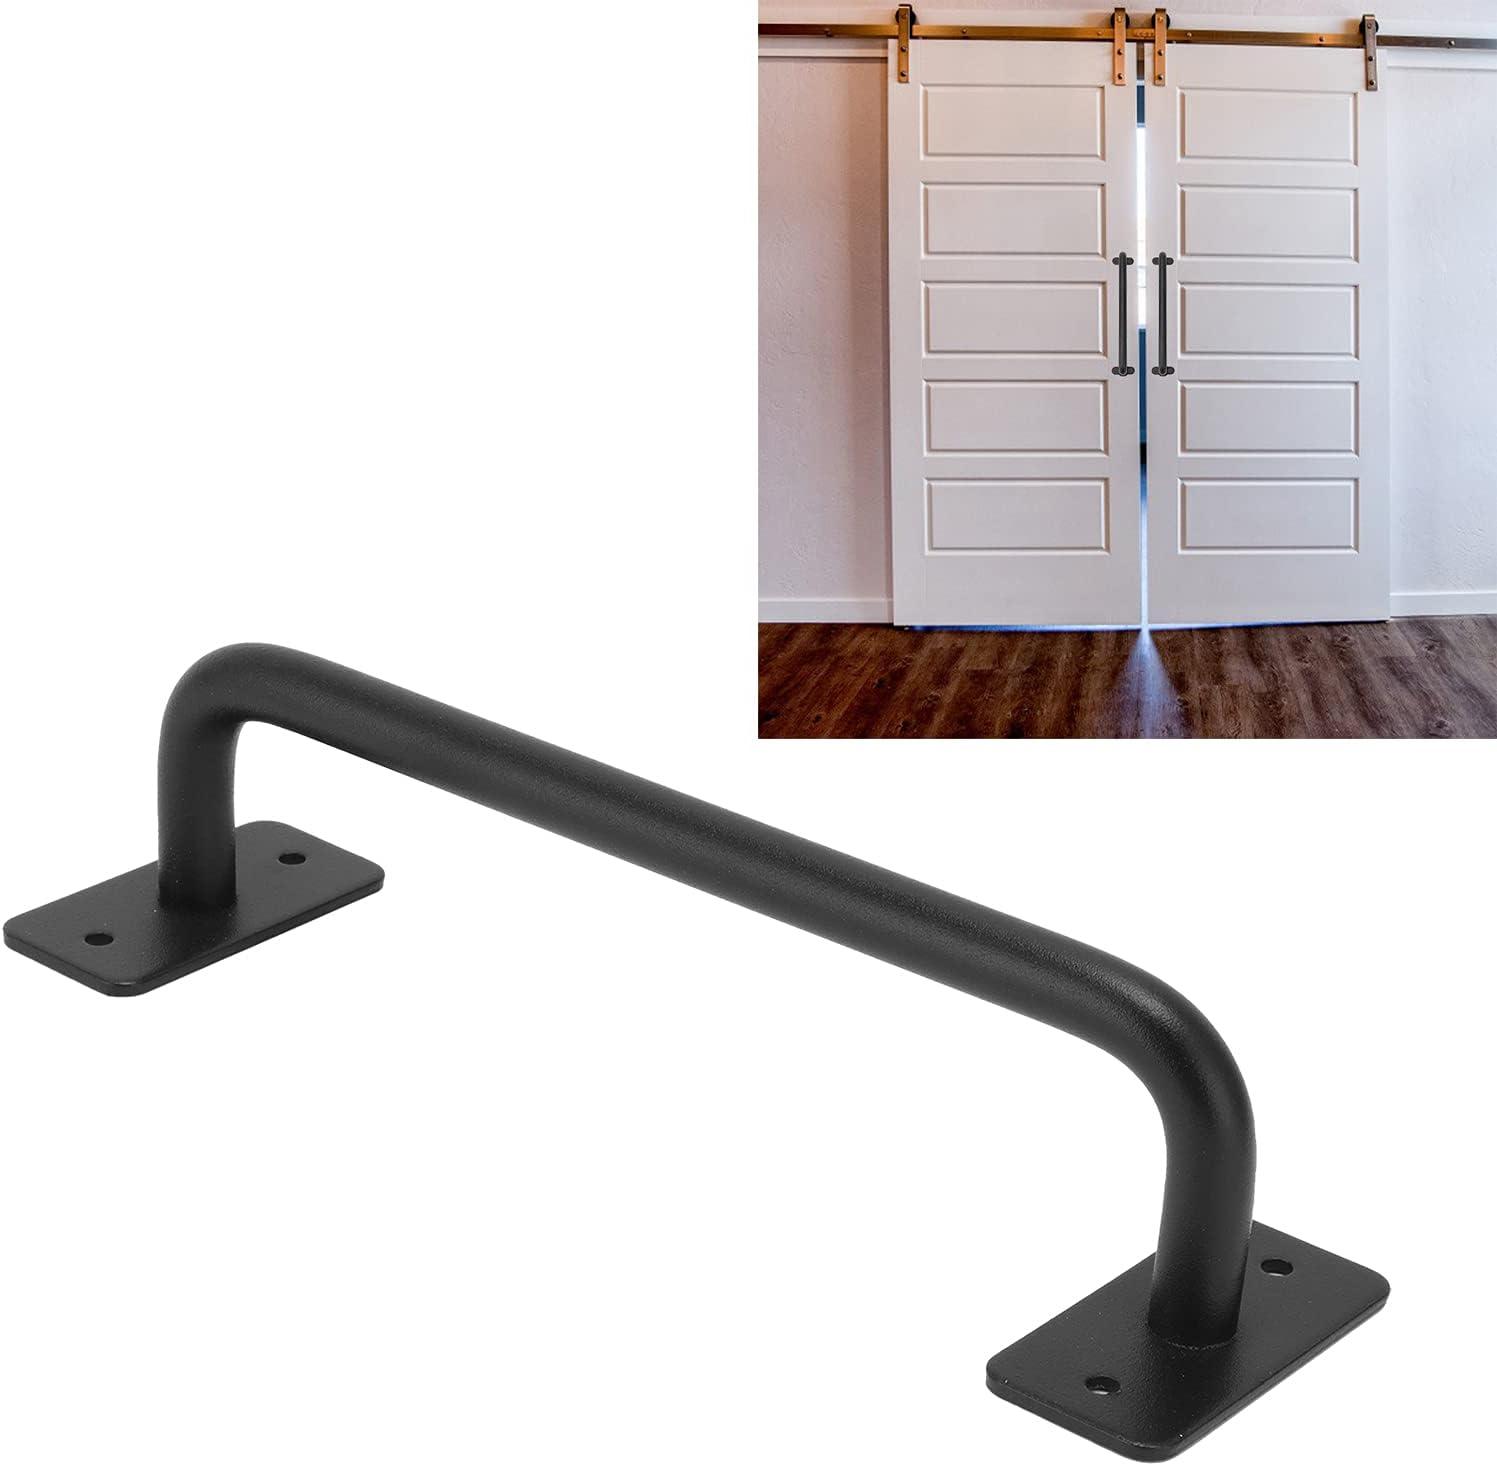 Barn Ranking TOP13 Door Pull Handle Durable Cabinet Garage Pul Brand new